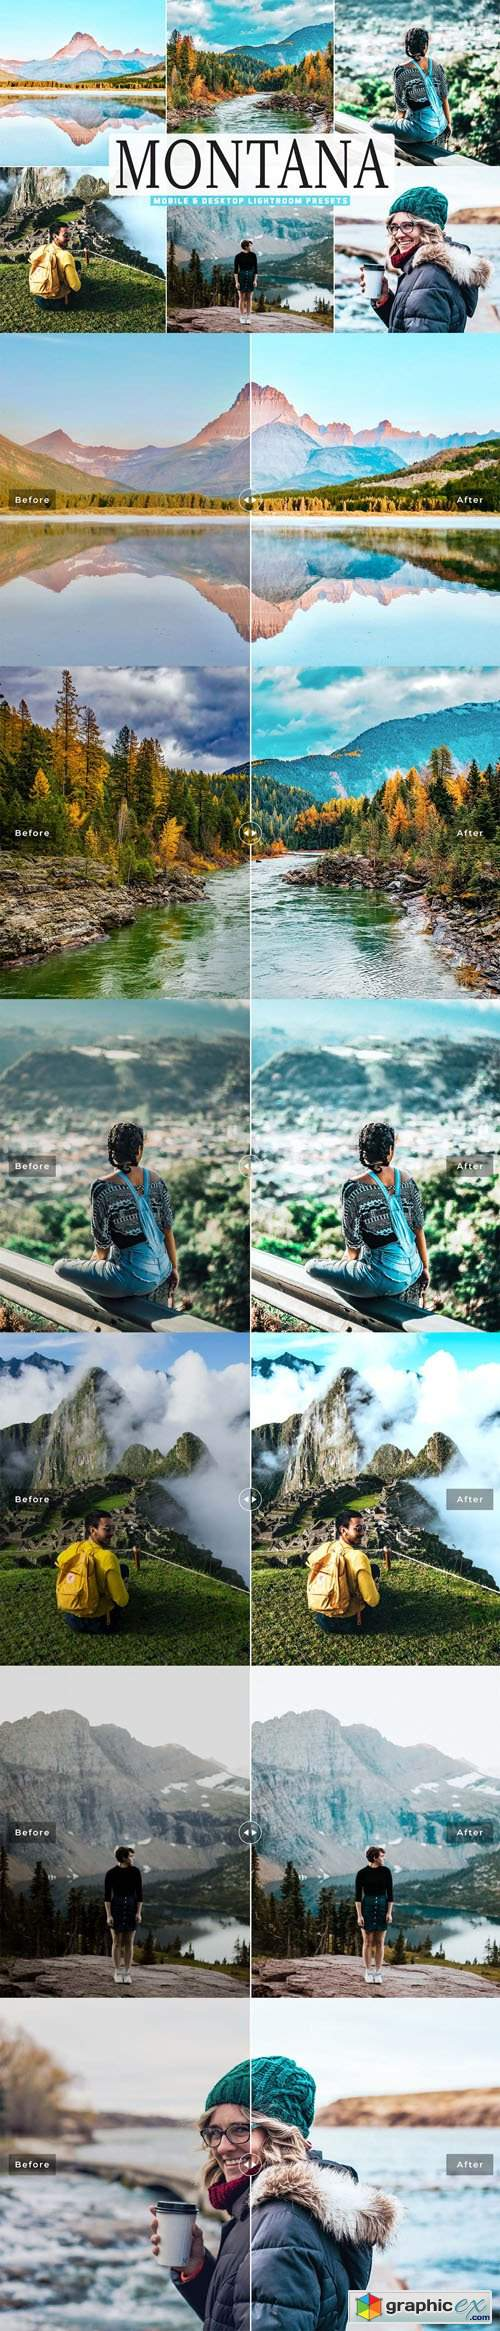 Montana Mobile & Desktop Lightroom Presets + Photoshop Actions